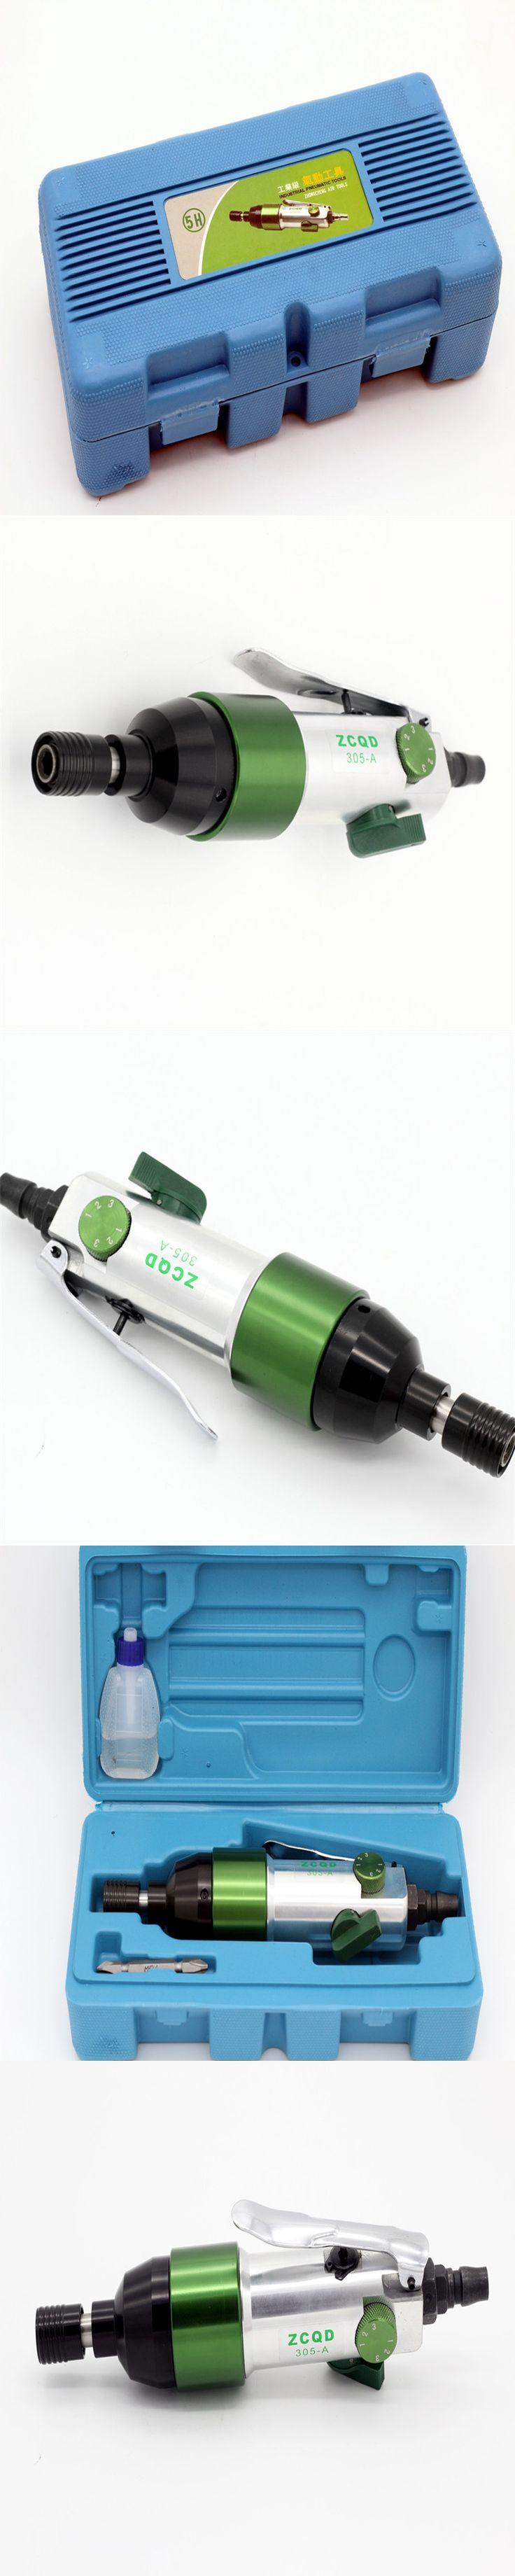 Pneumatic Air Screwdriver 5H air tool pneumatic tools Strong type power tool free shipping